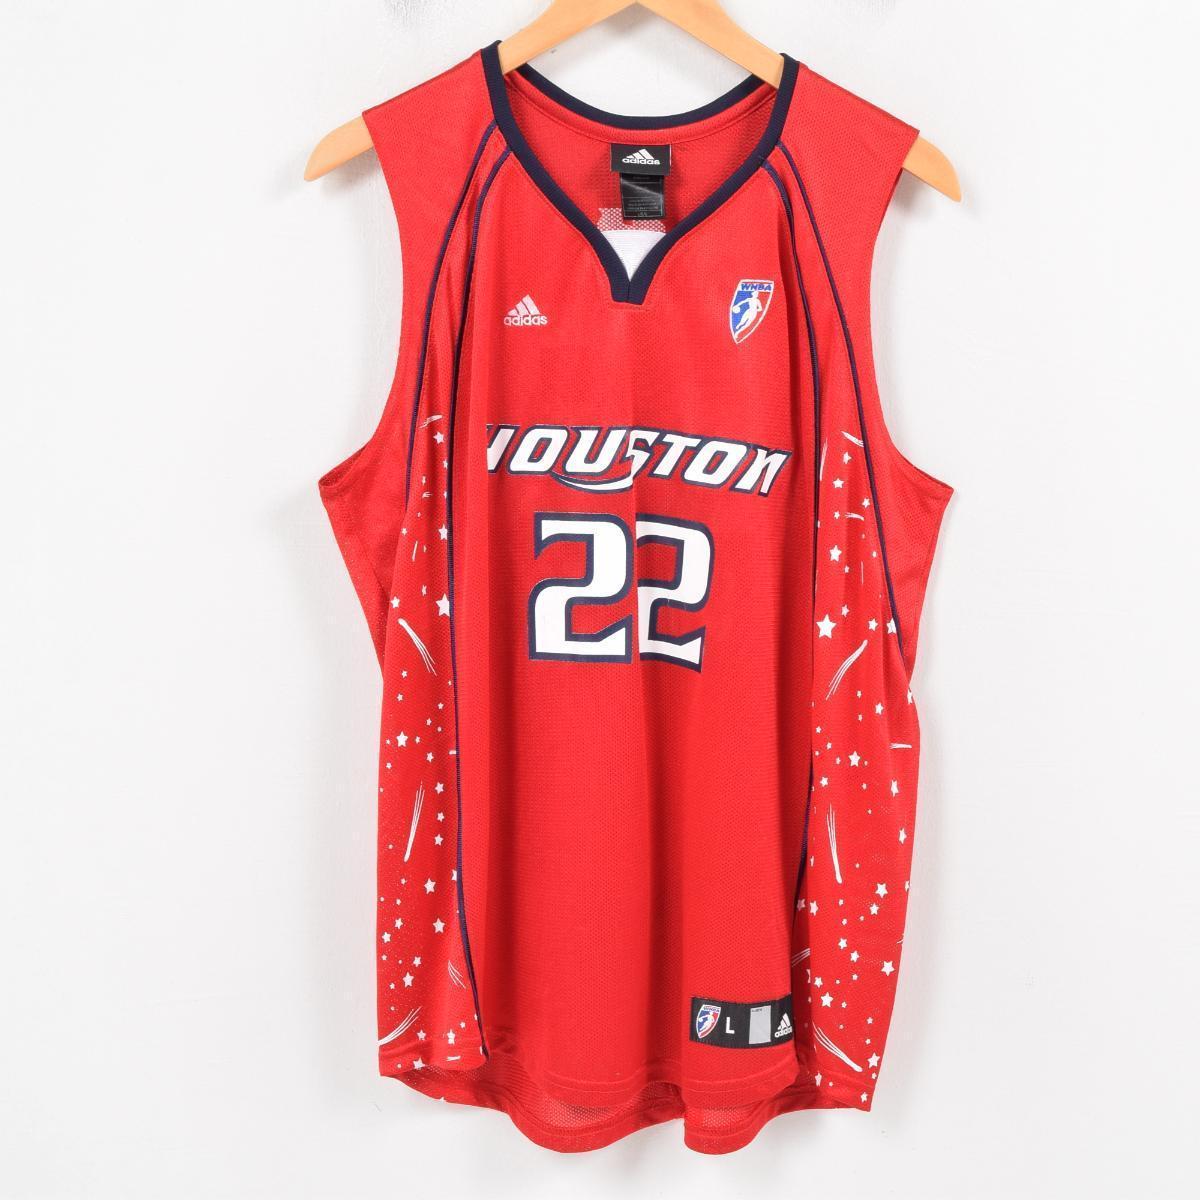 e61827f0024 Adidas adidas WNBA HOUSTON ROCKETS ヒューストンロケッツシェリルスウープス SHERYL SWOOPES game  shirt replica uniform Lady s XL  wat6185